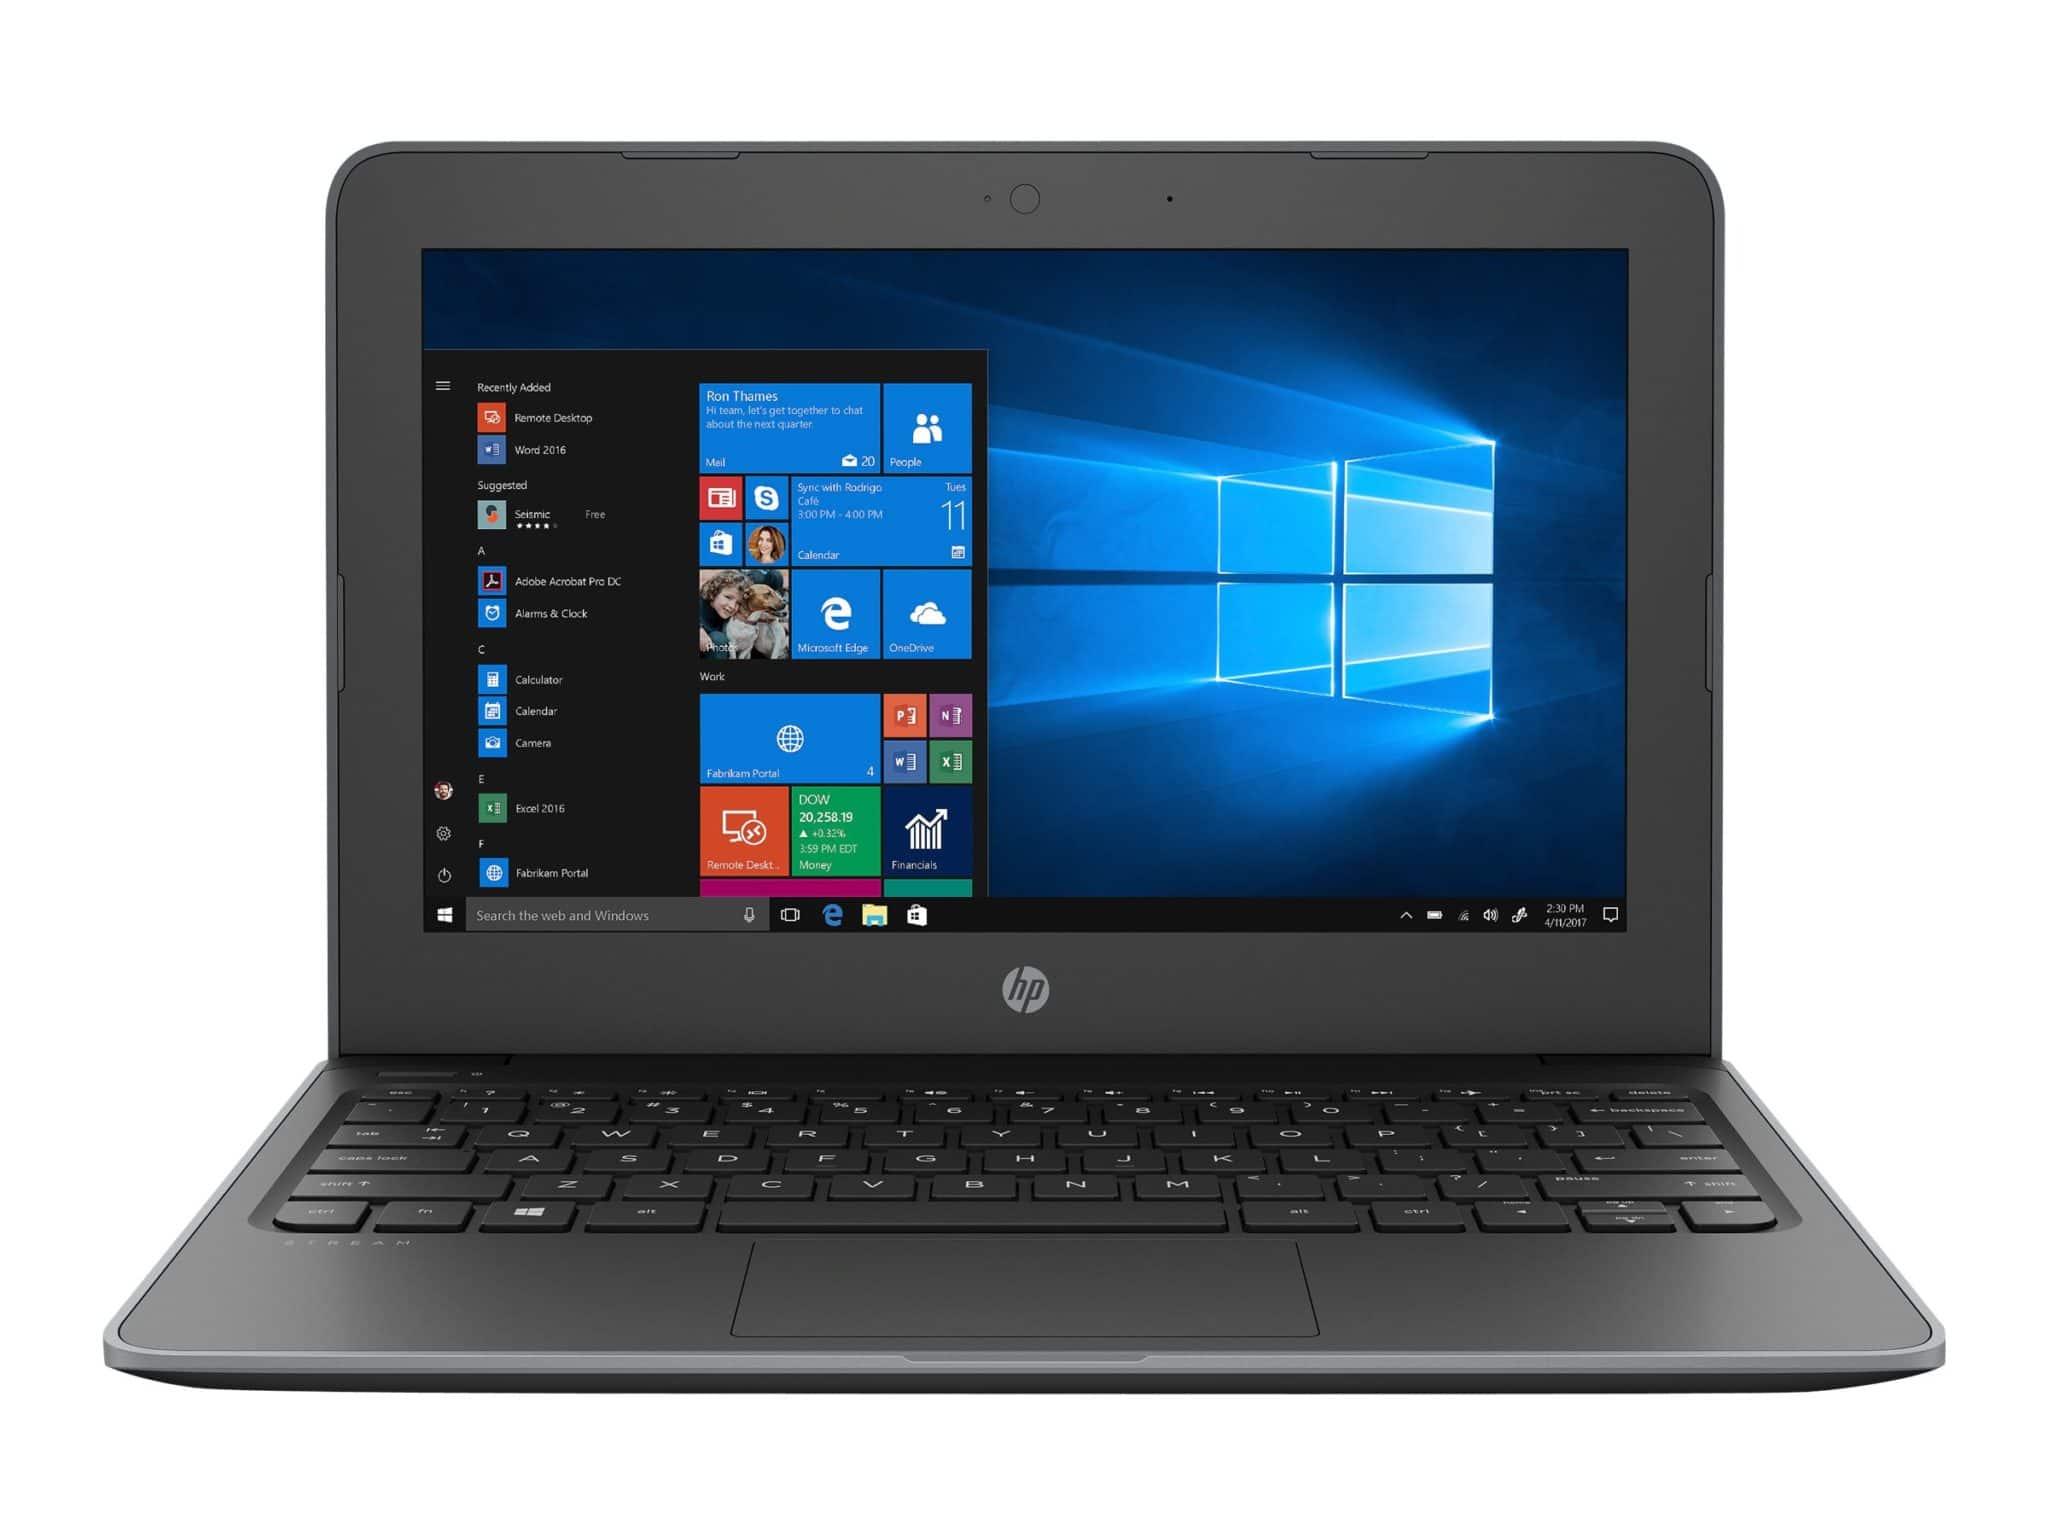 "HP Stream Pro 11 G5 - Smart Buy - 11.6"" - Celeron N4100 - 4 GB RAM - Notebook"